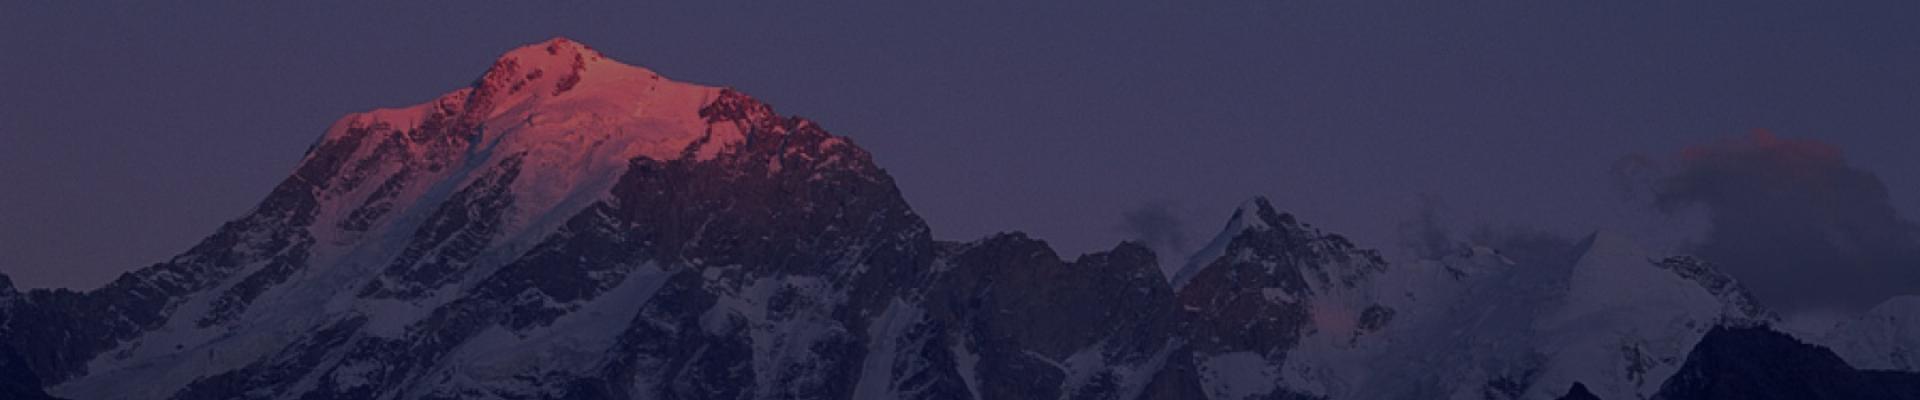 Adventure things to do in Dharamshala, Himachal Pradesh, India